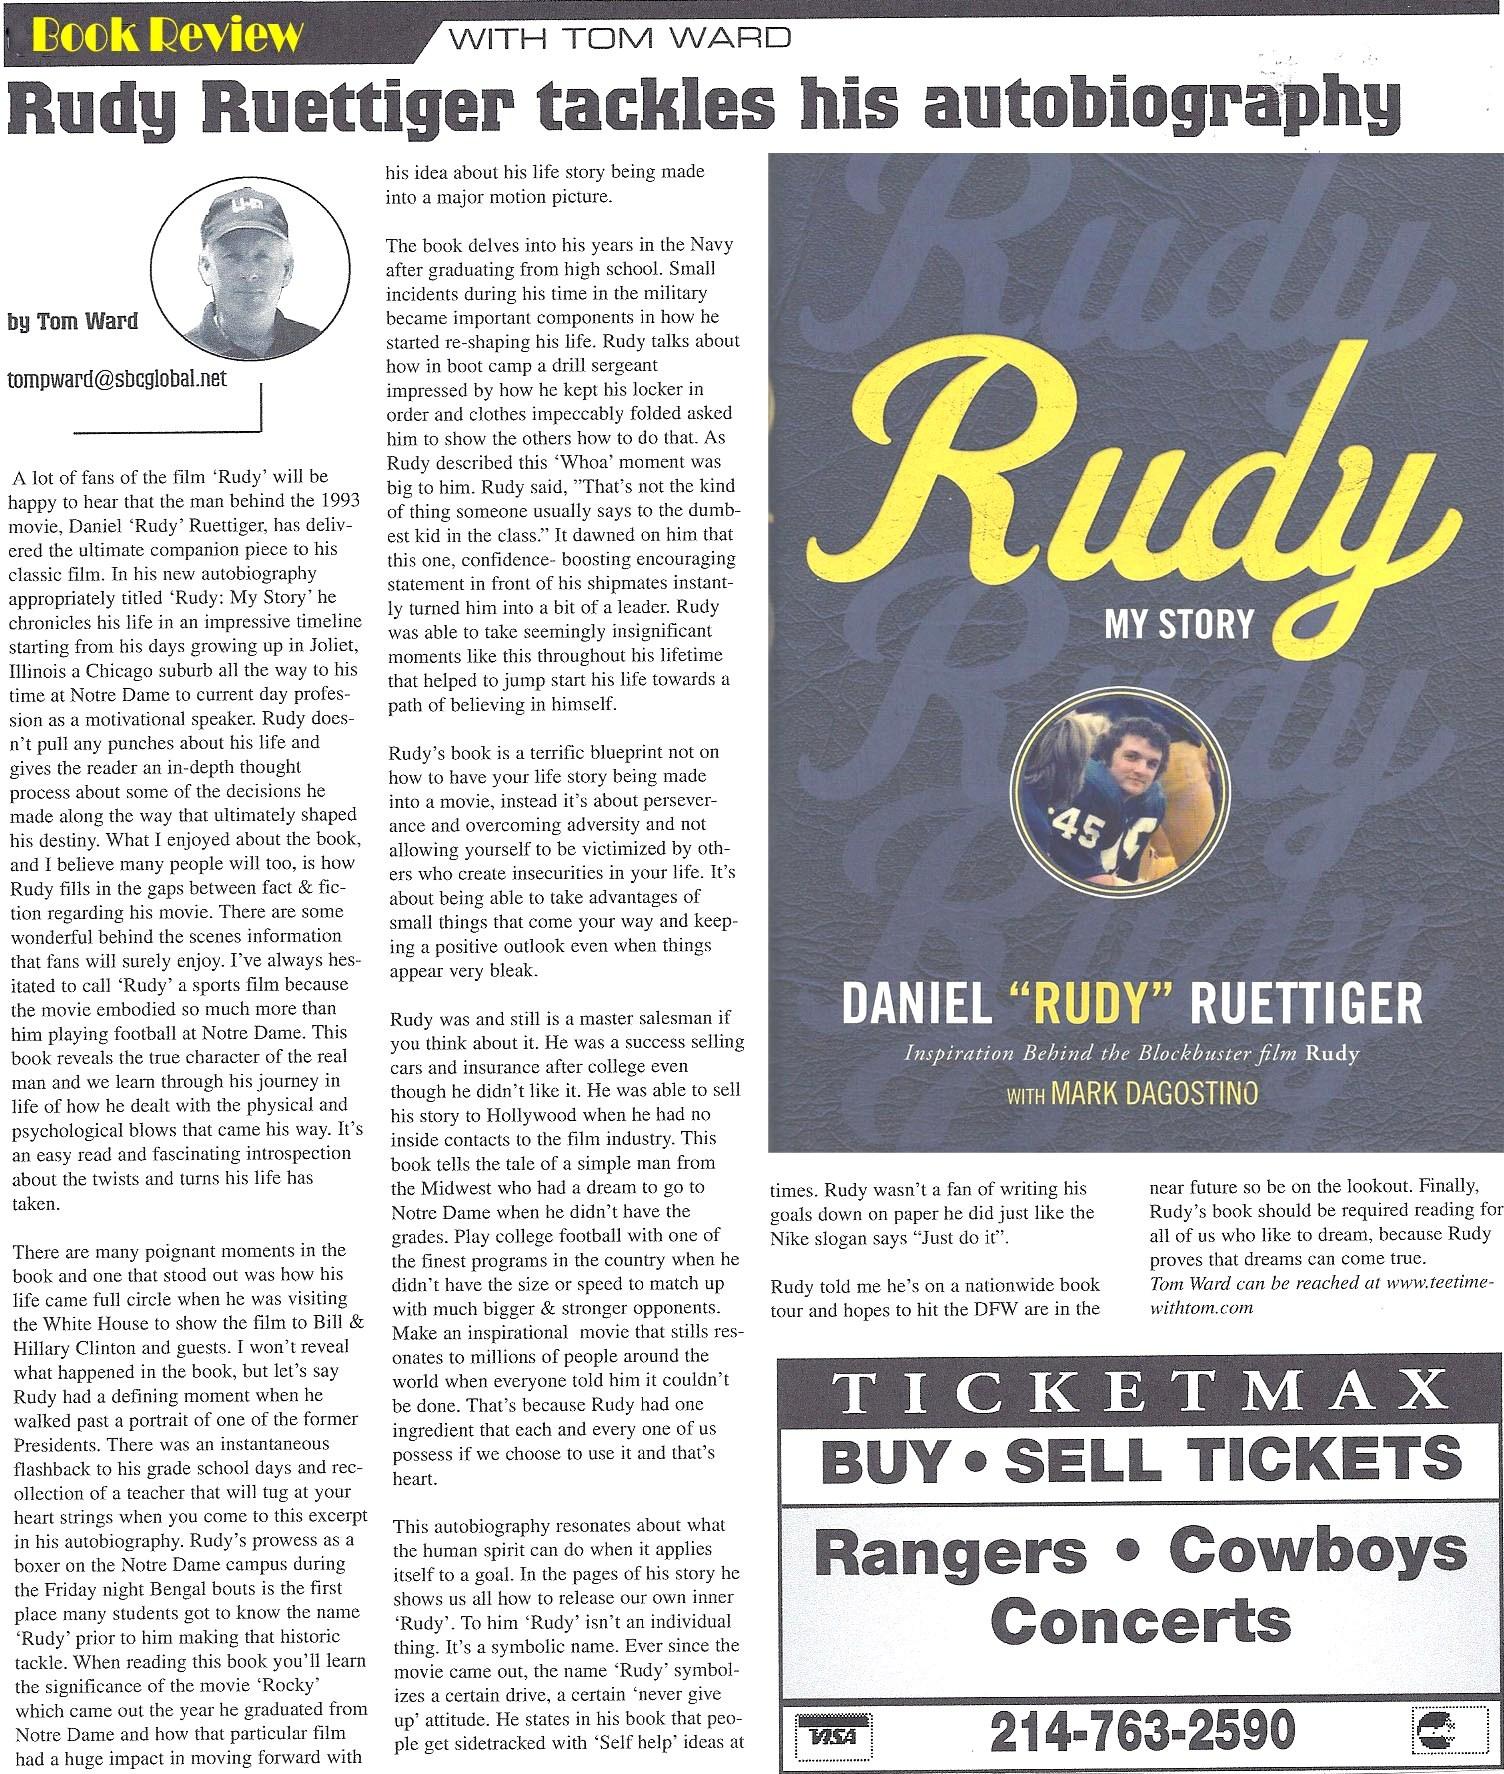 RudyBook Review